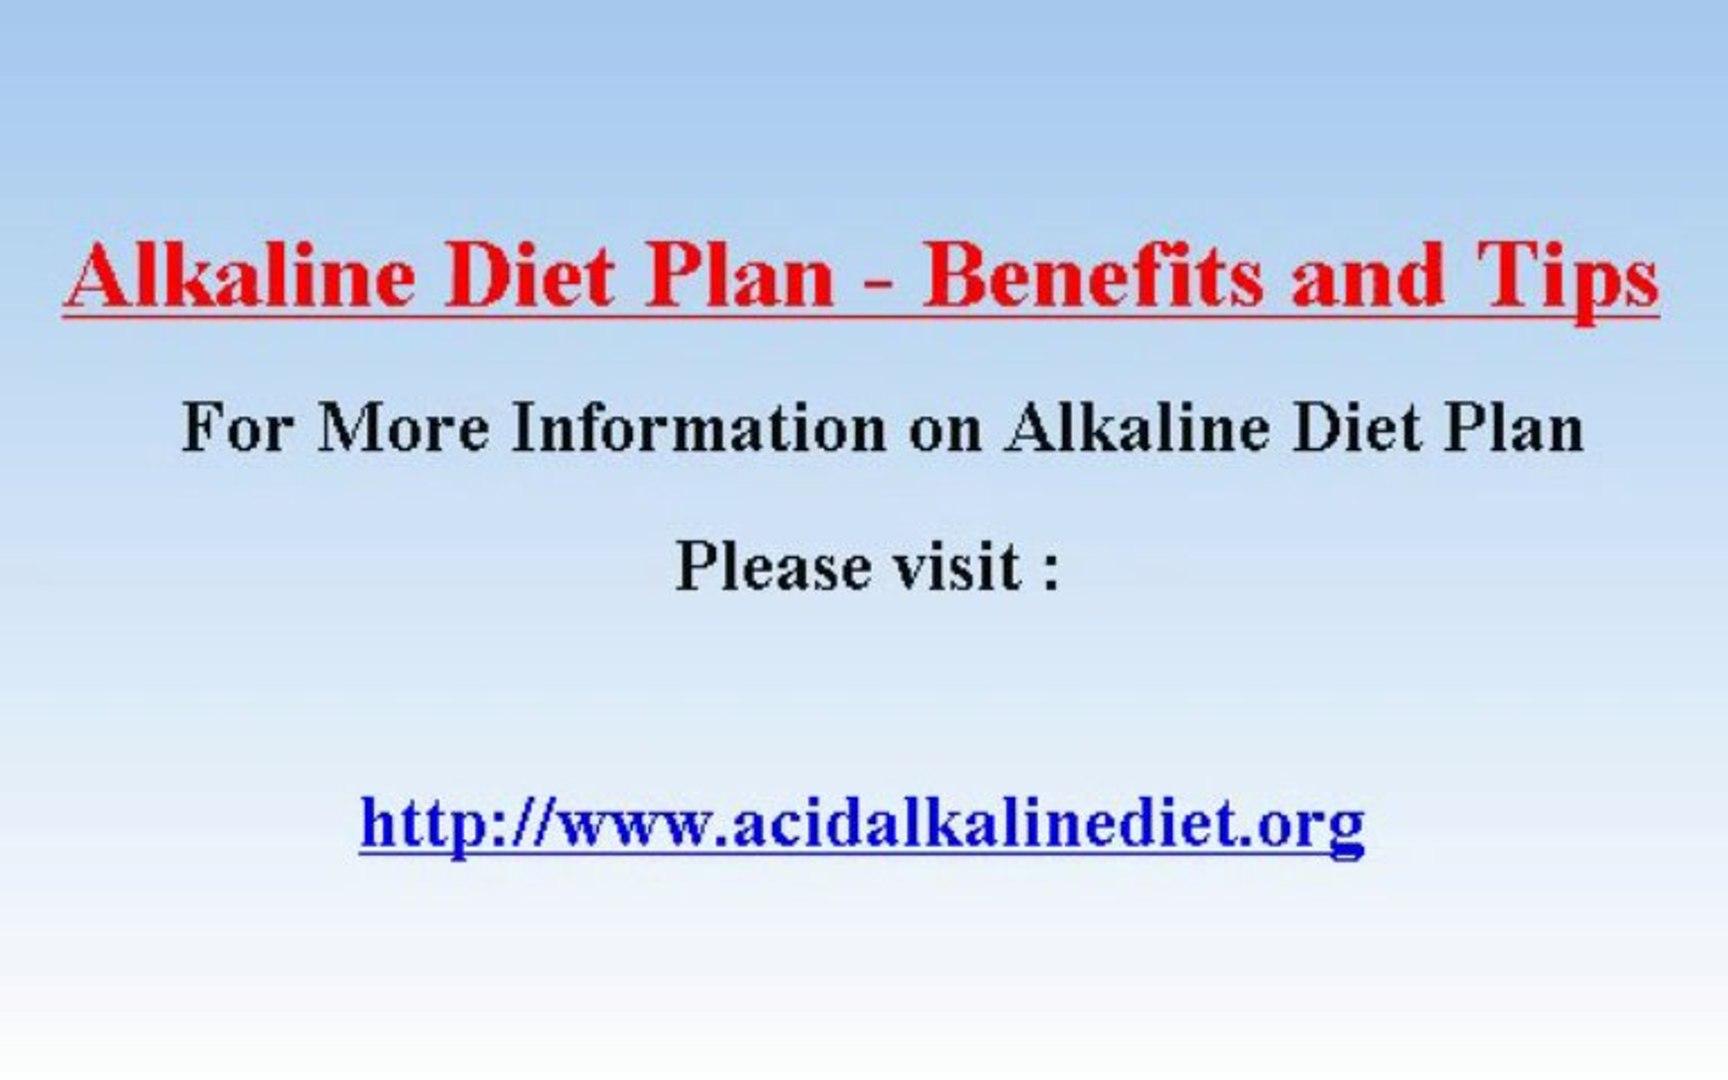 Alkaline Diet Plan - Benefits and Tips